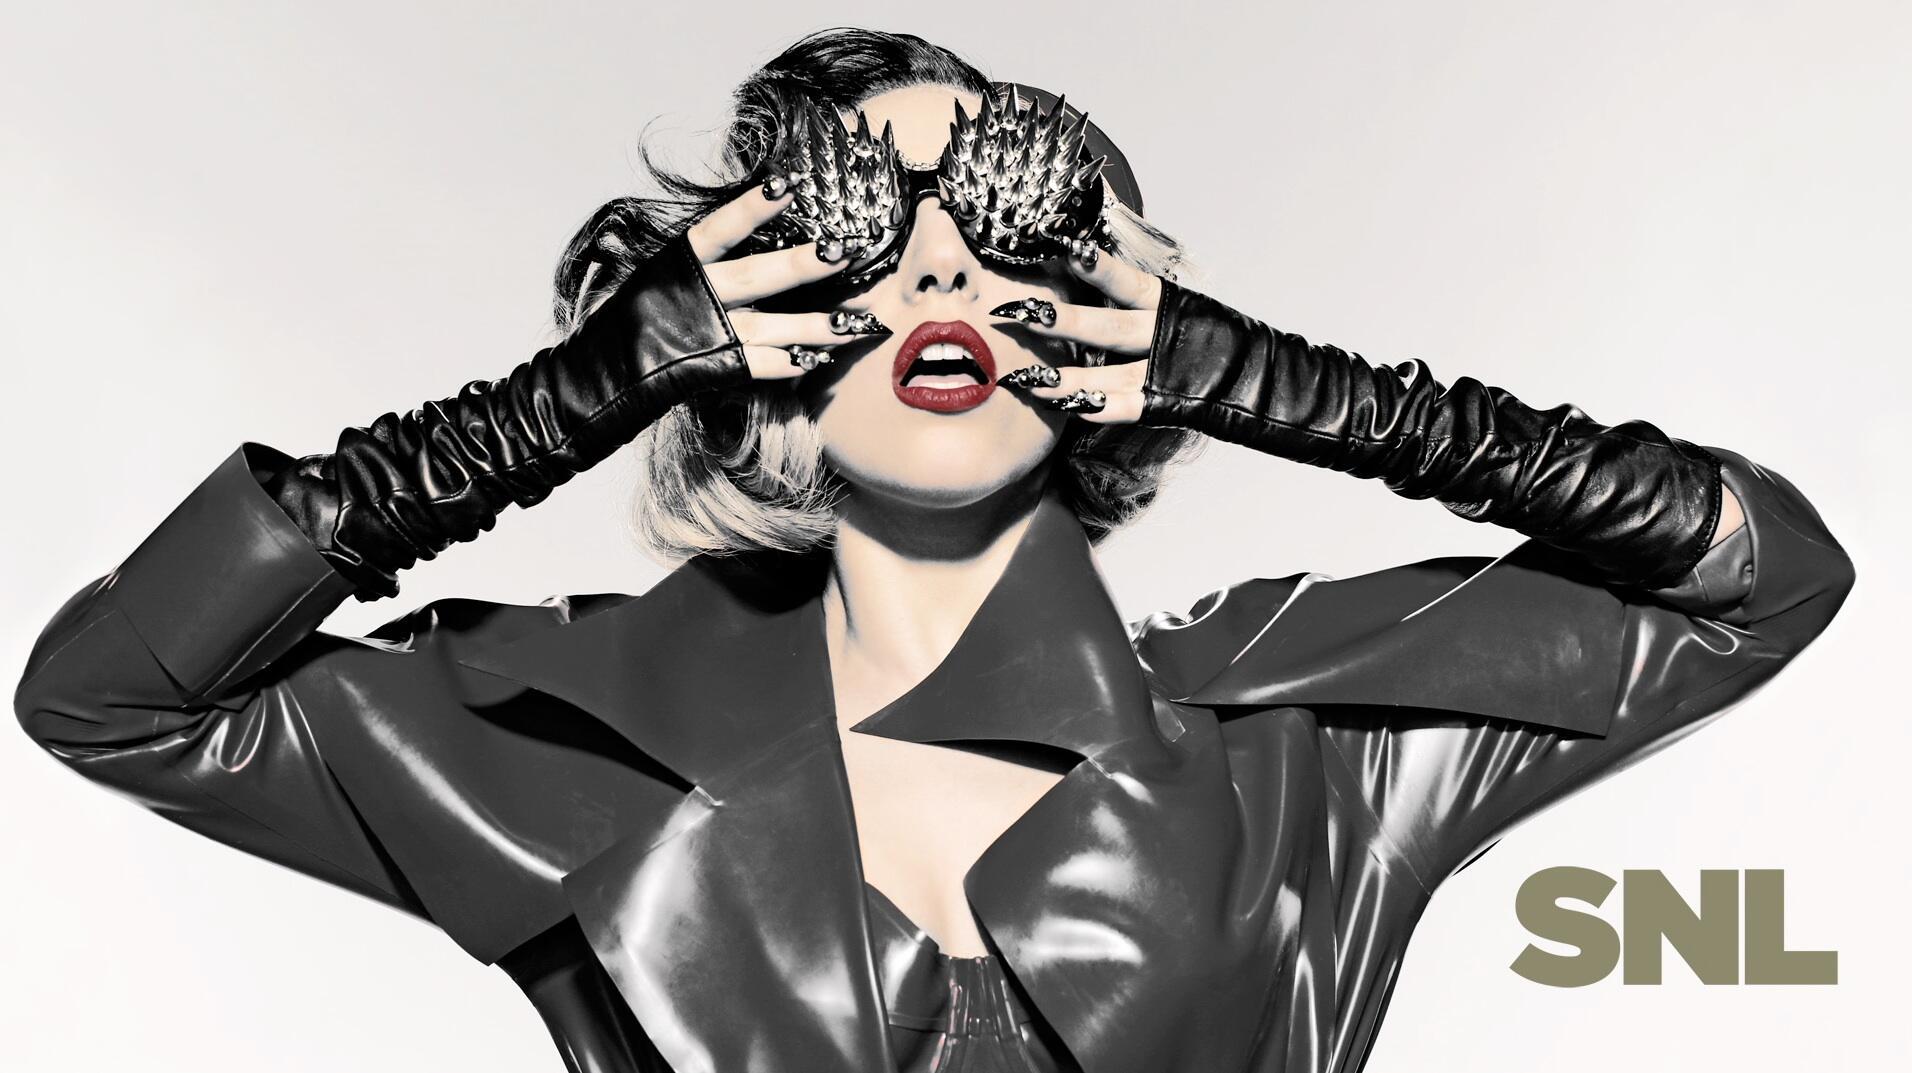 File:SNL Lady Gaga.jpg